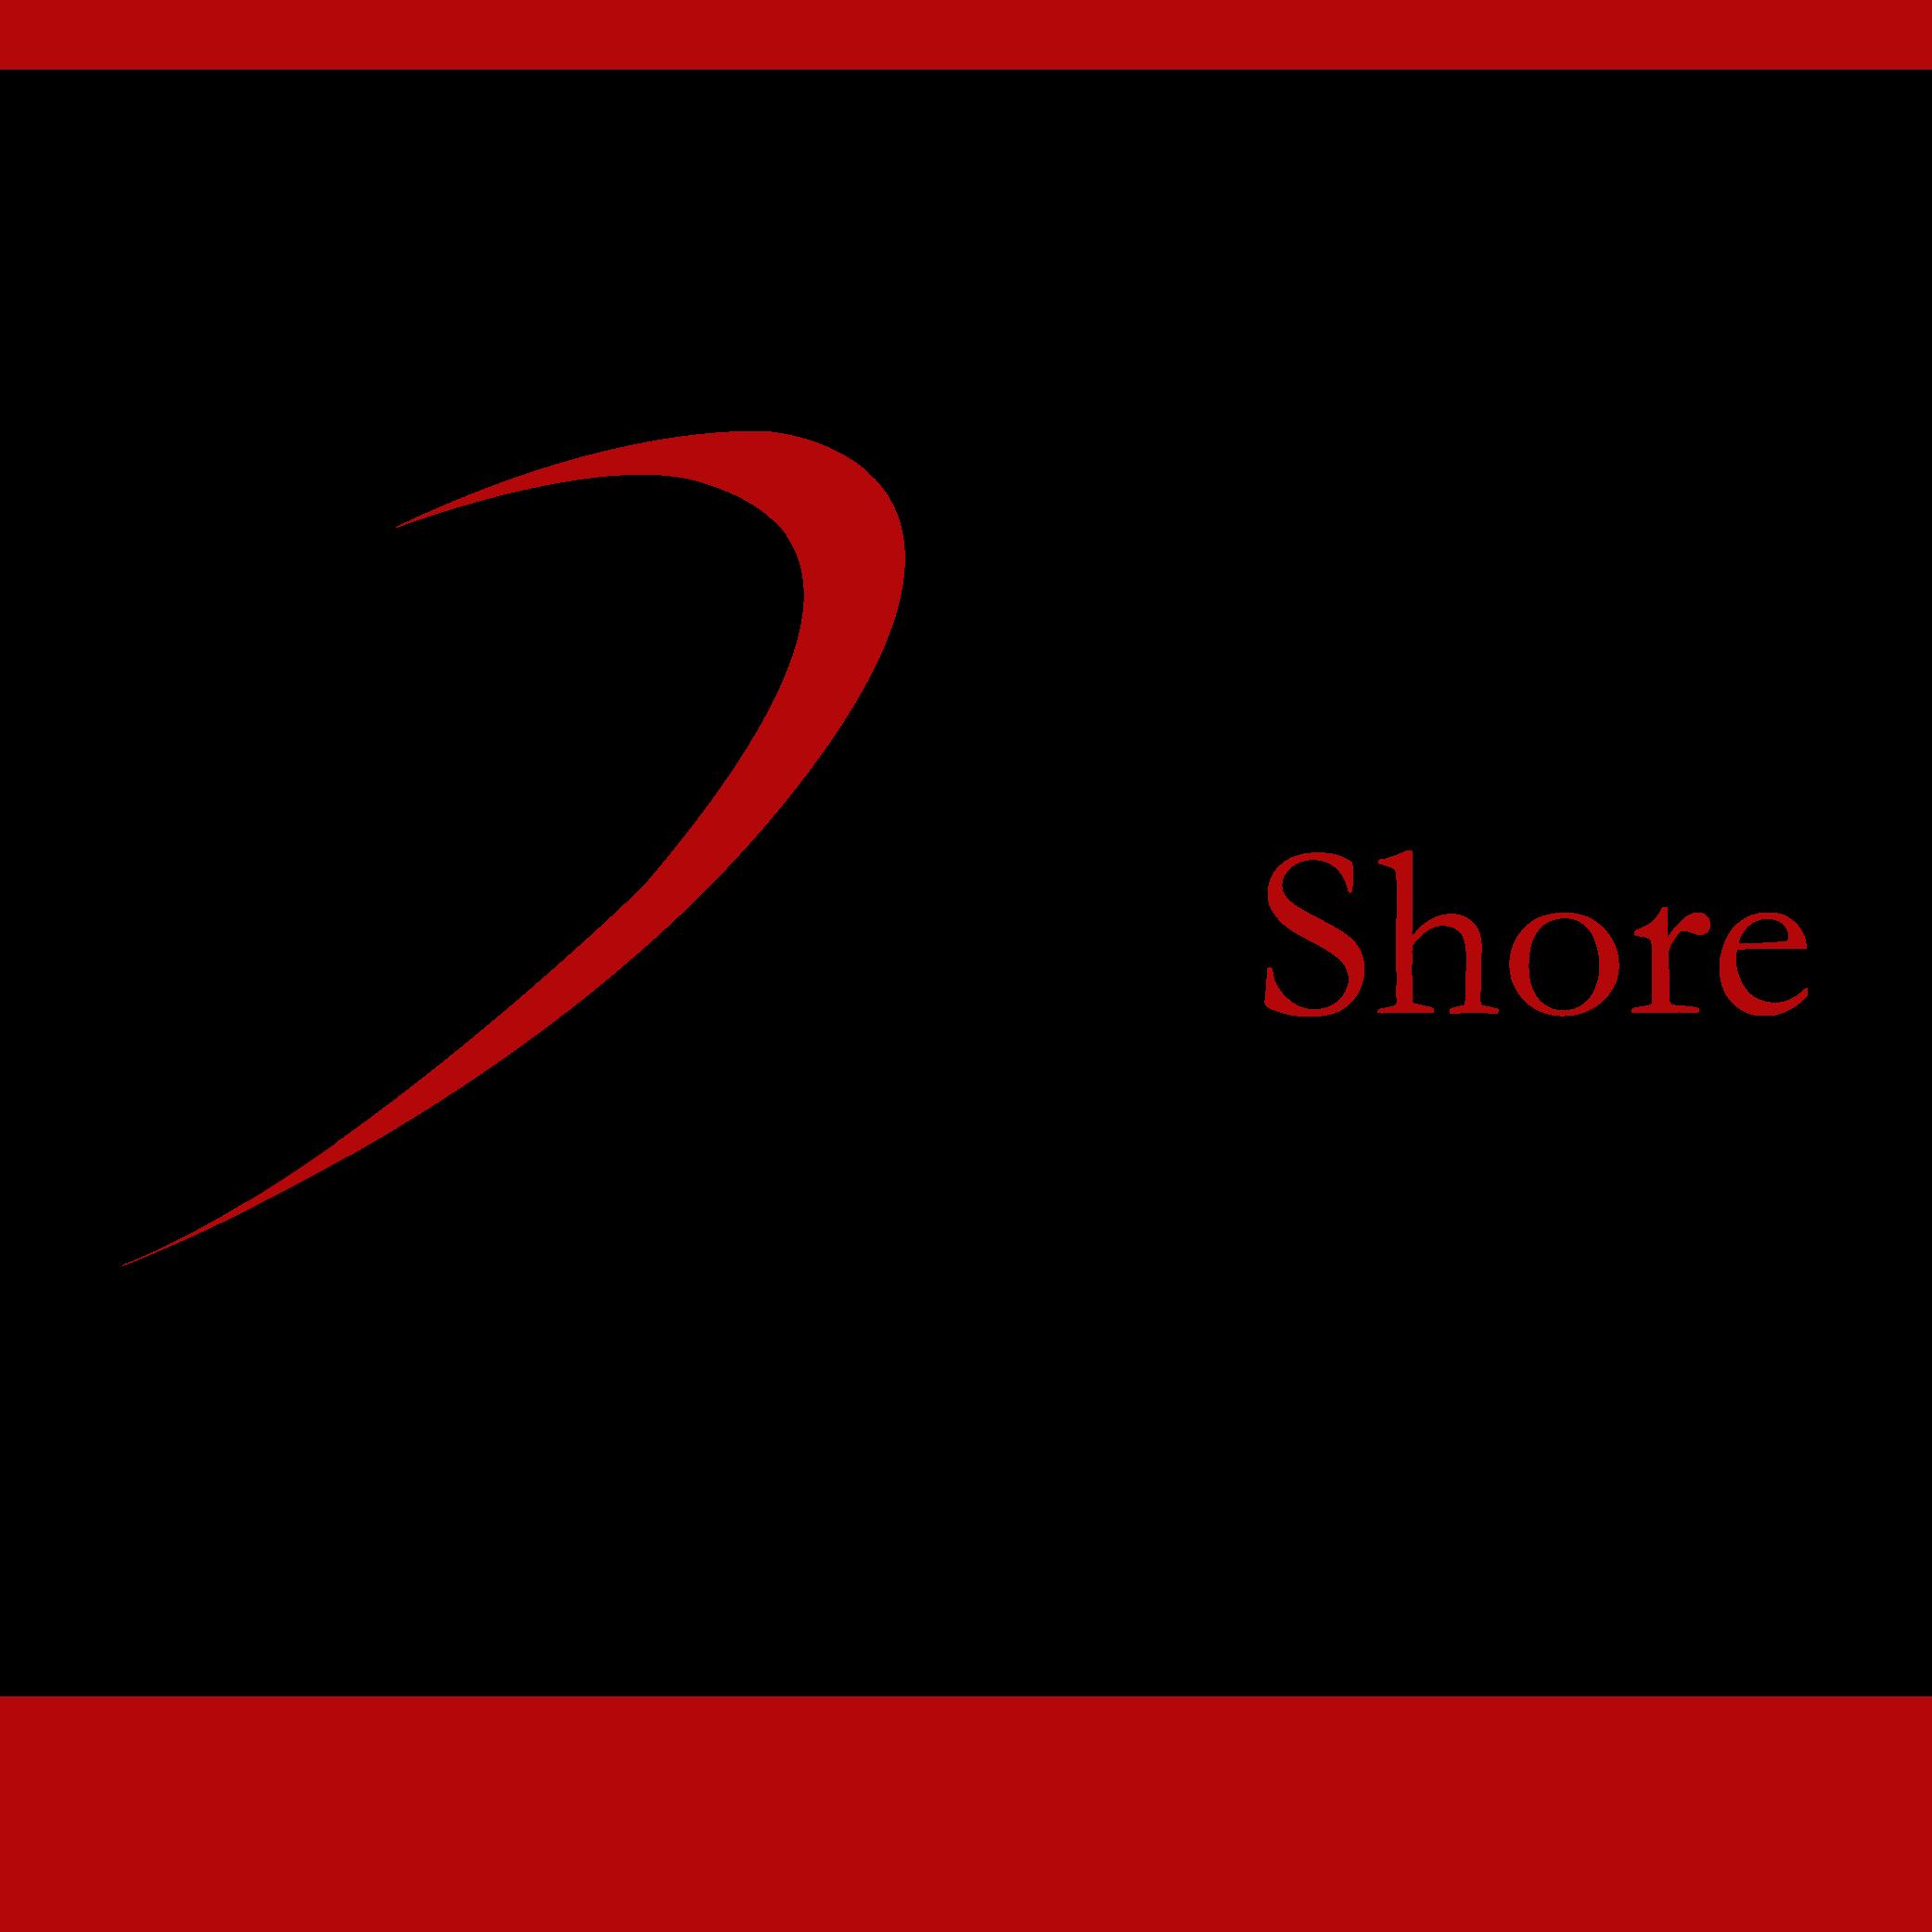 Lake Shore Marketing